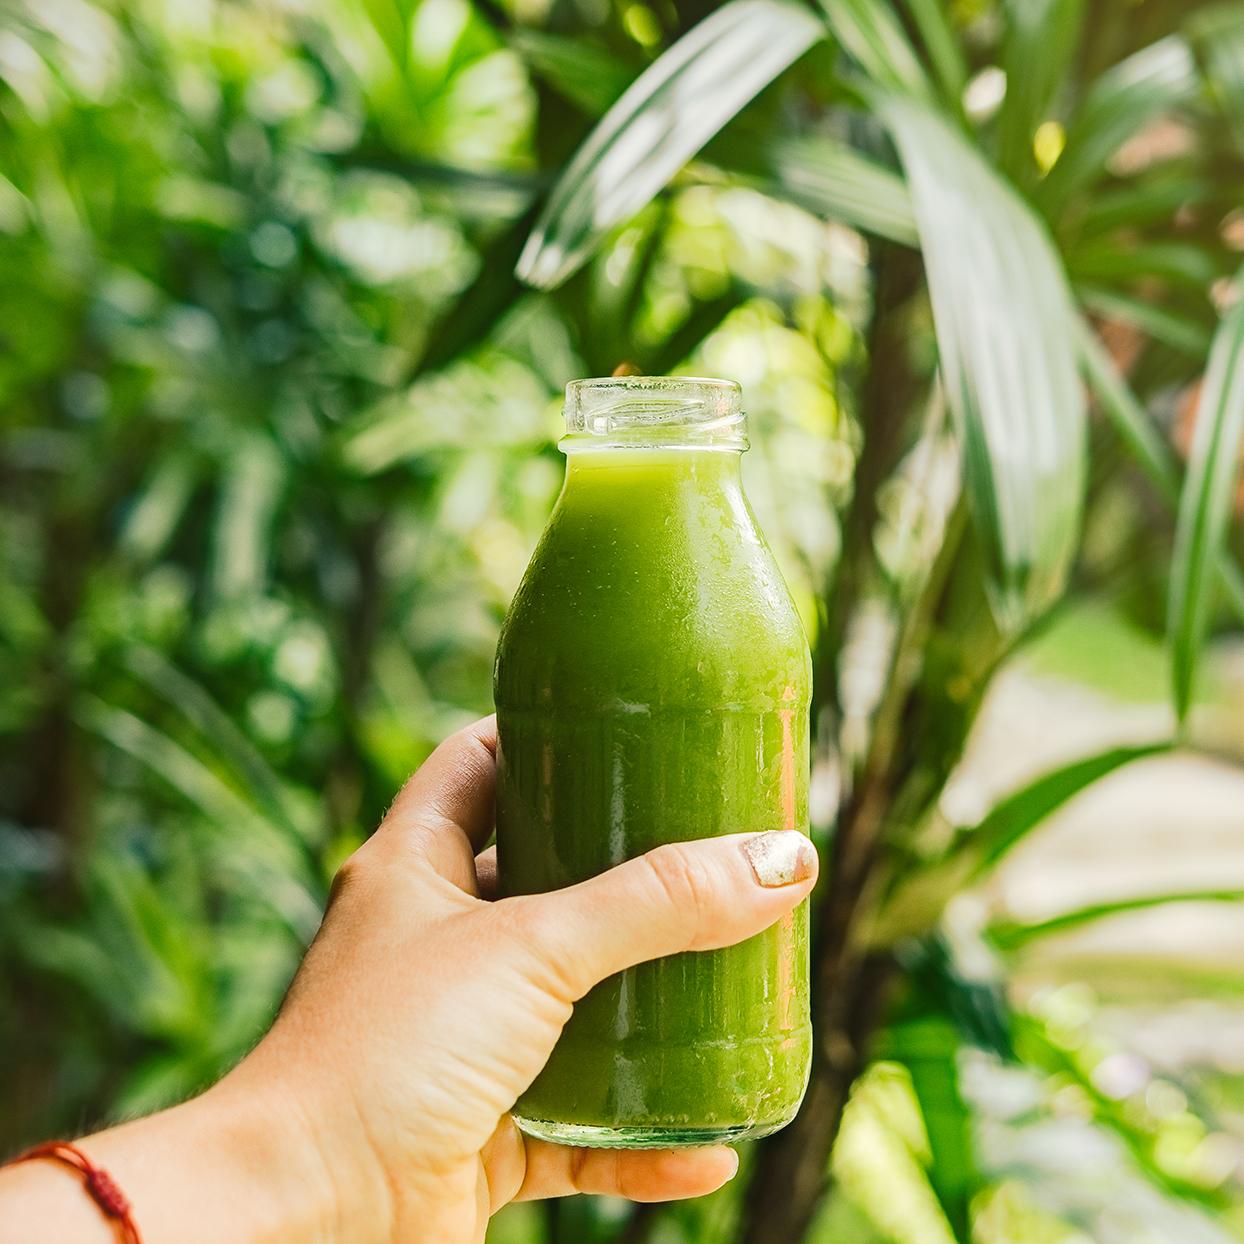 Eat More Fruits And Veggies Through Juicing